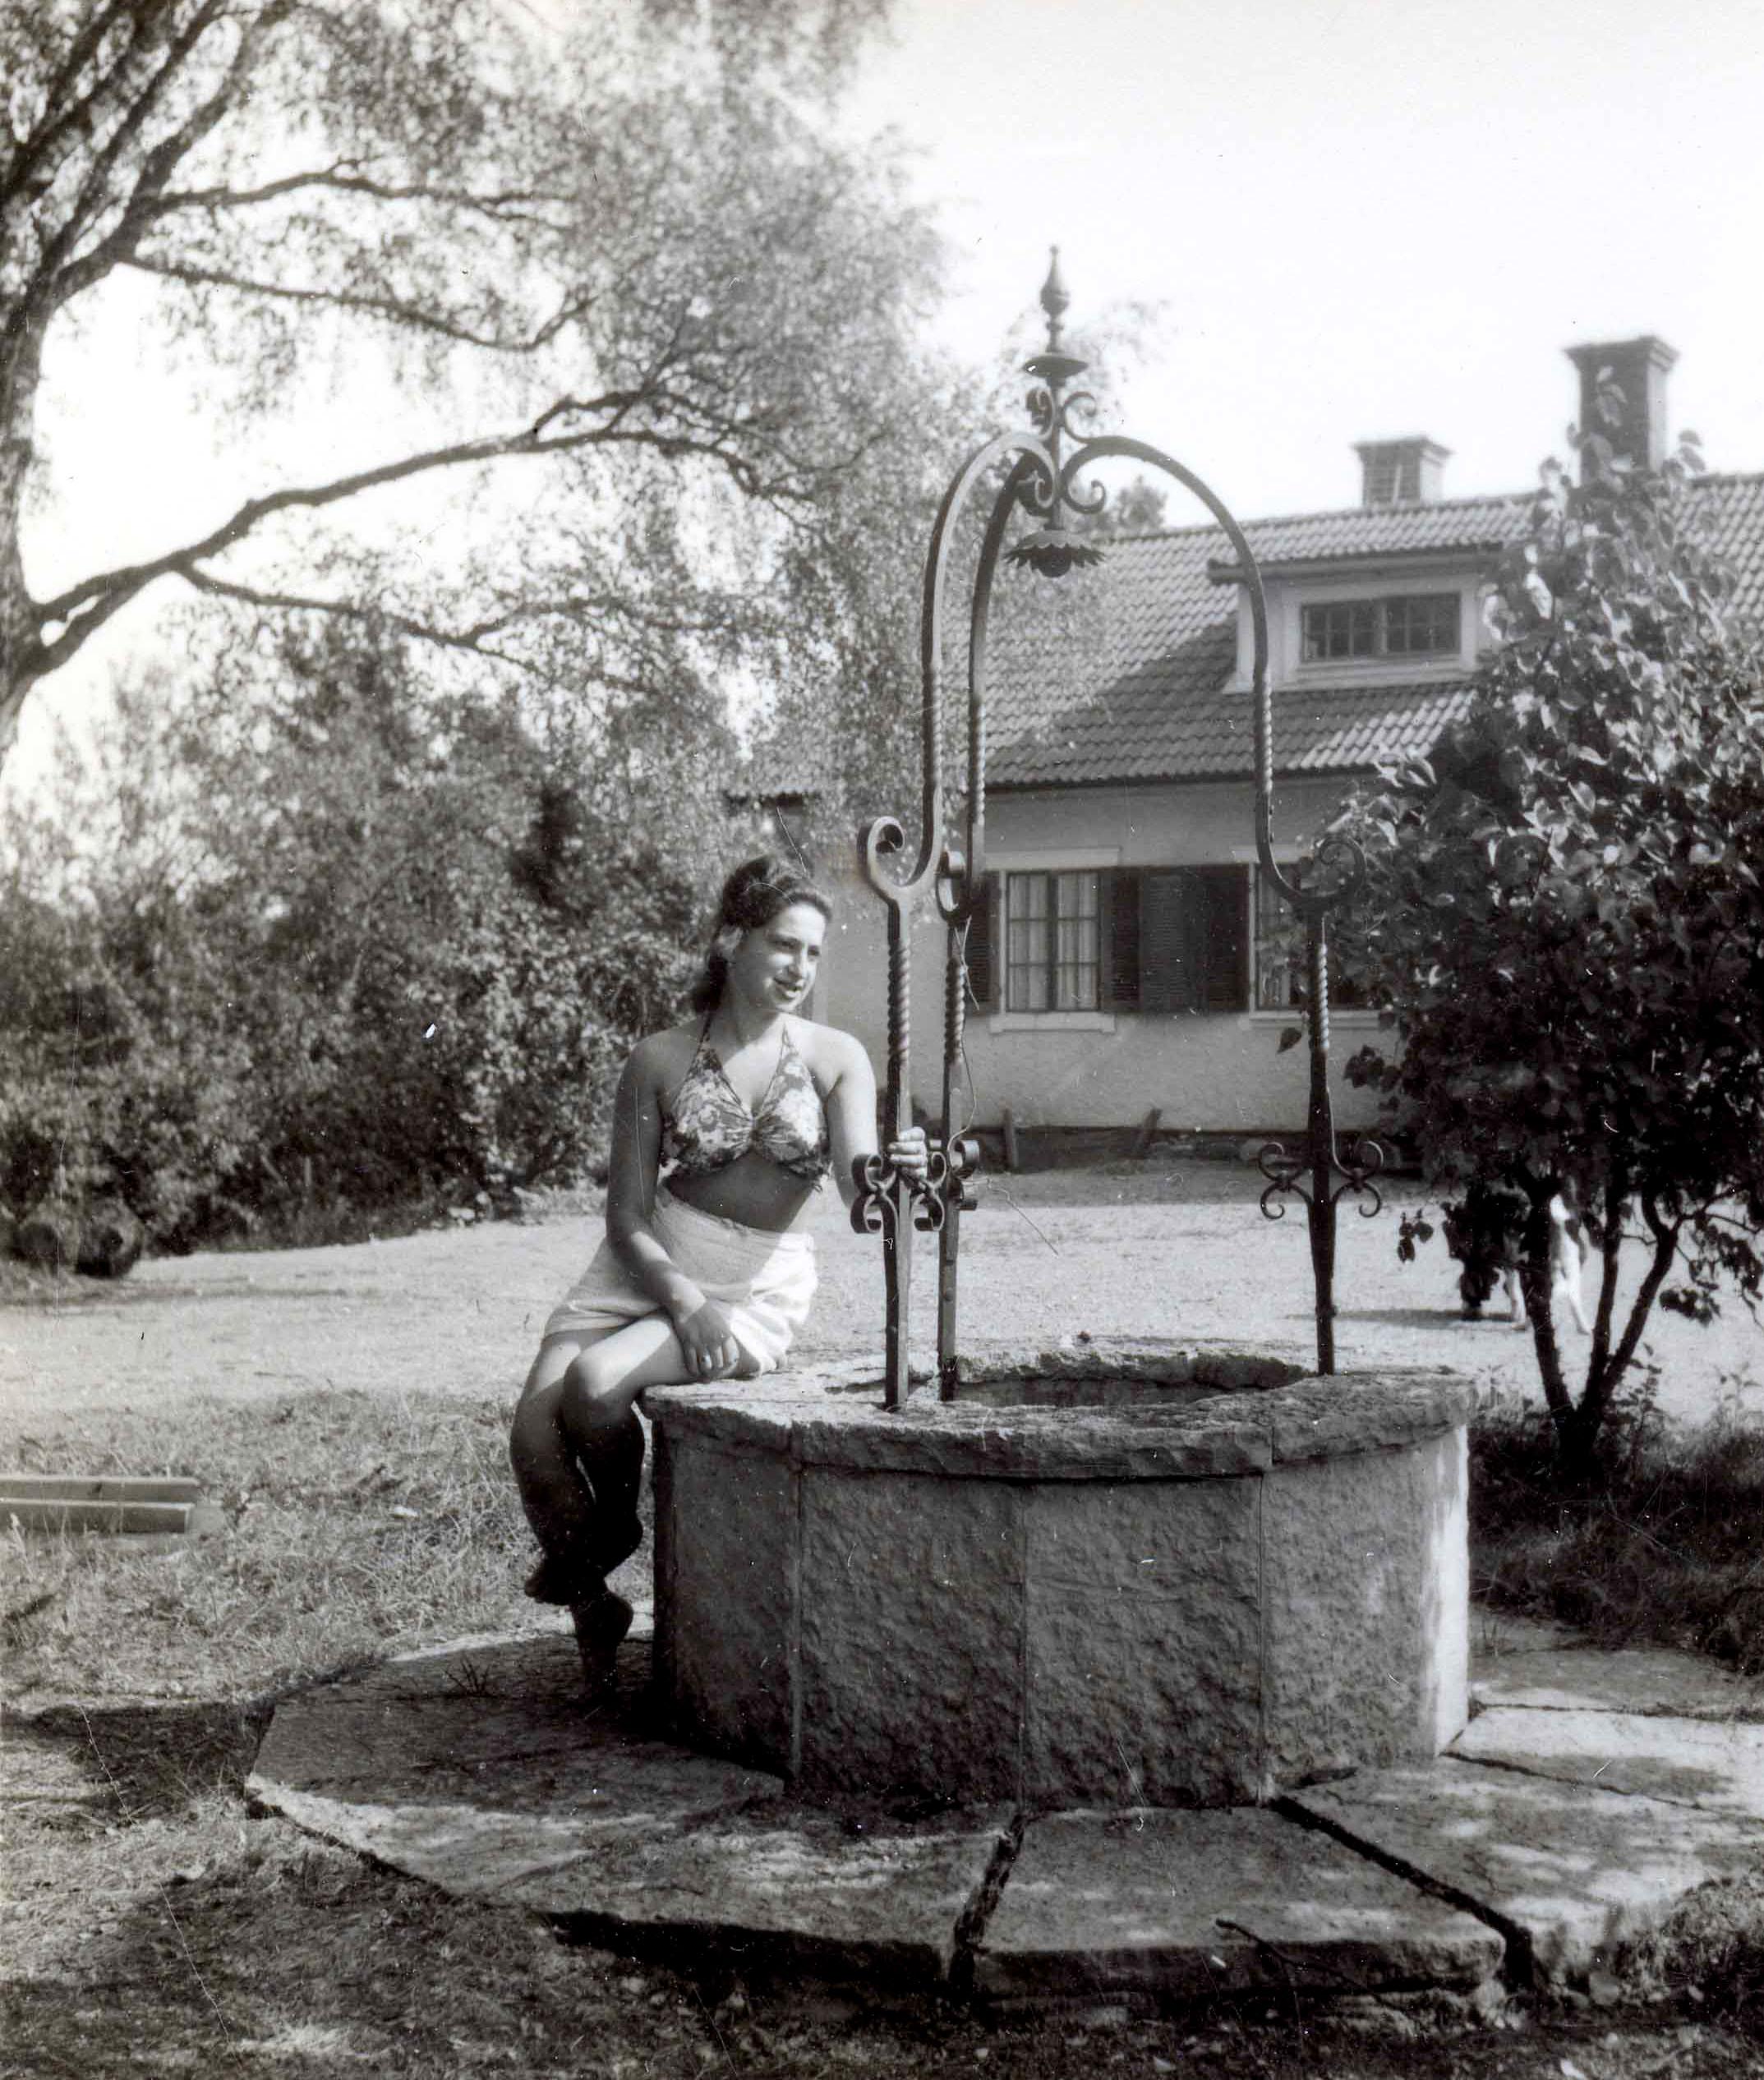 Hana by Jensine & Arne's home in 1941.